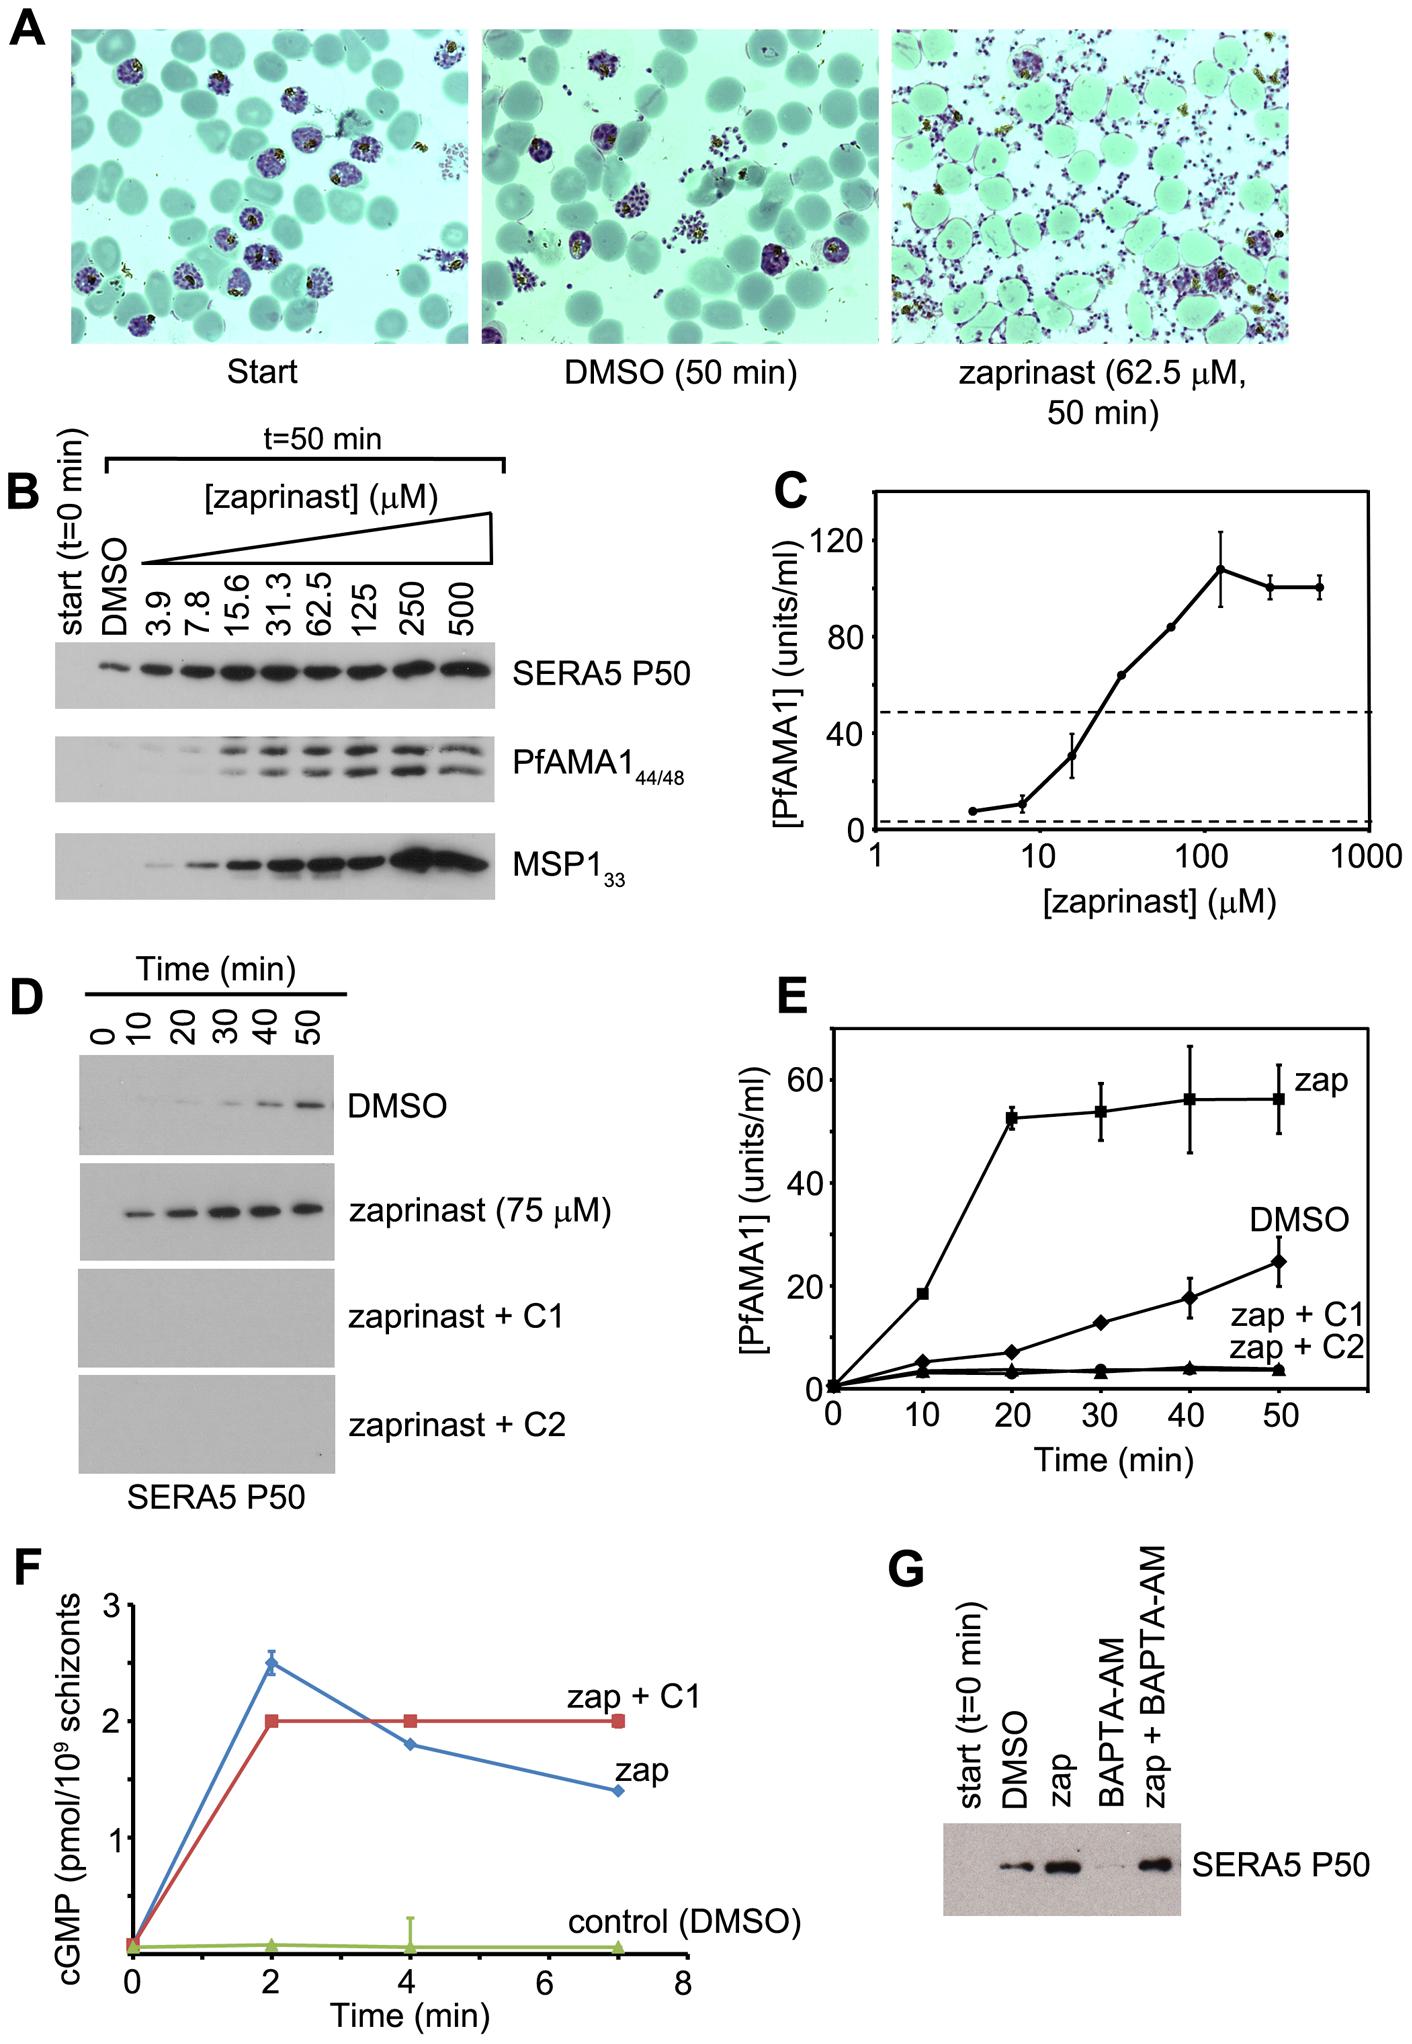 The phosphodiesterase inhibitor zaprinast induces premature egress in a cGMP-dependent manner.